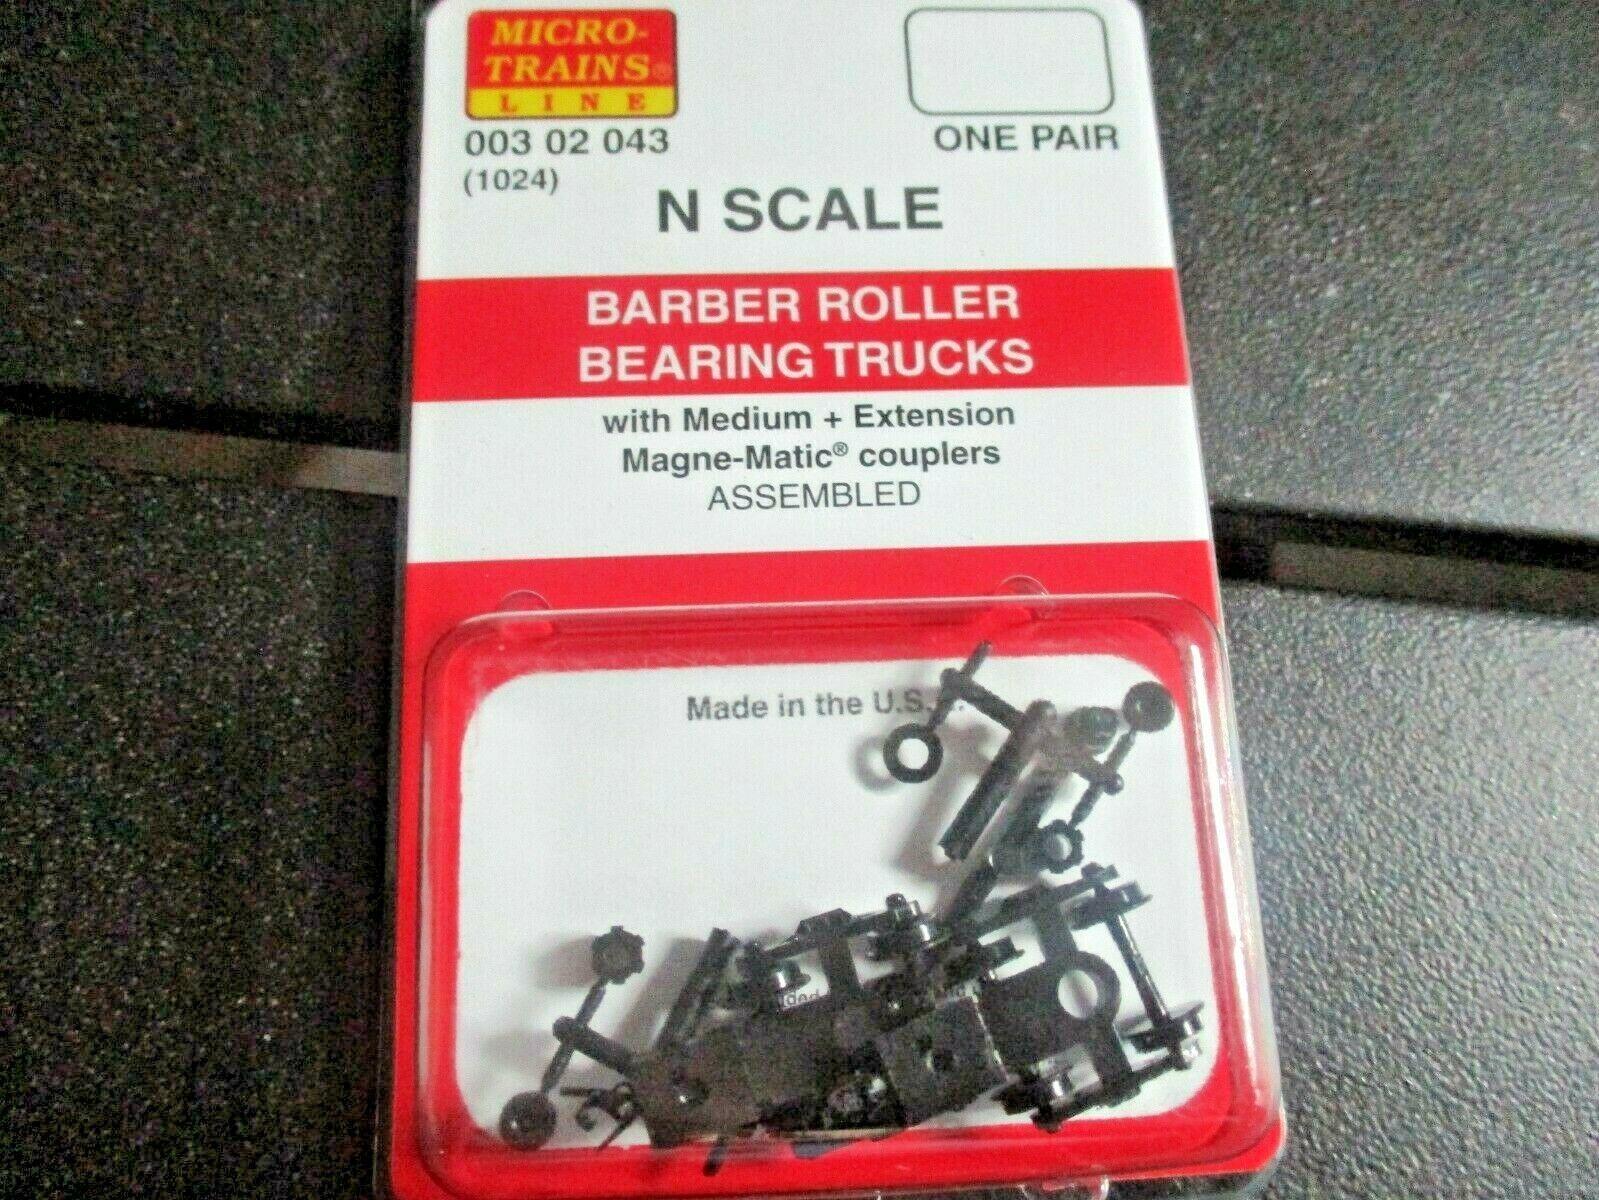 Micro-Trains Stock # 00302043 (1026) Barber Roller Bearing Trucks Medium Ext Cou